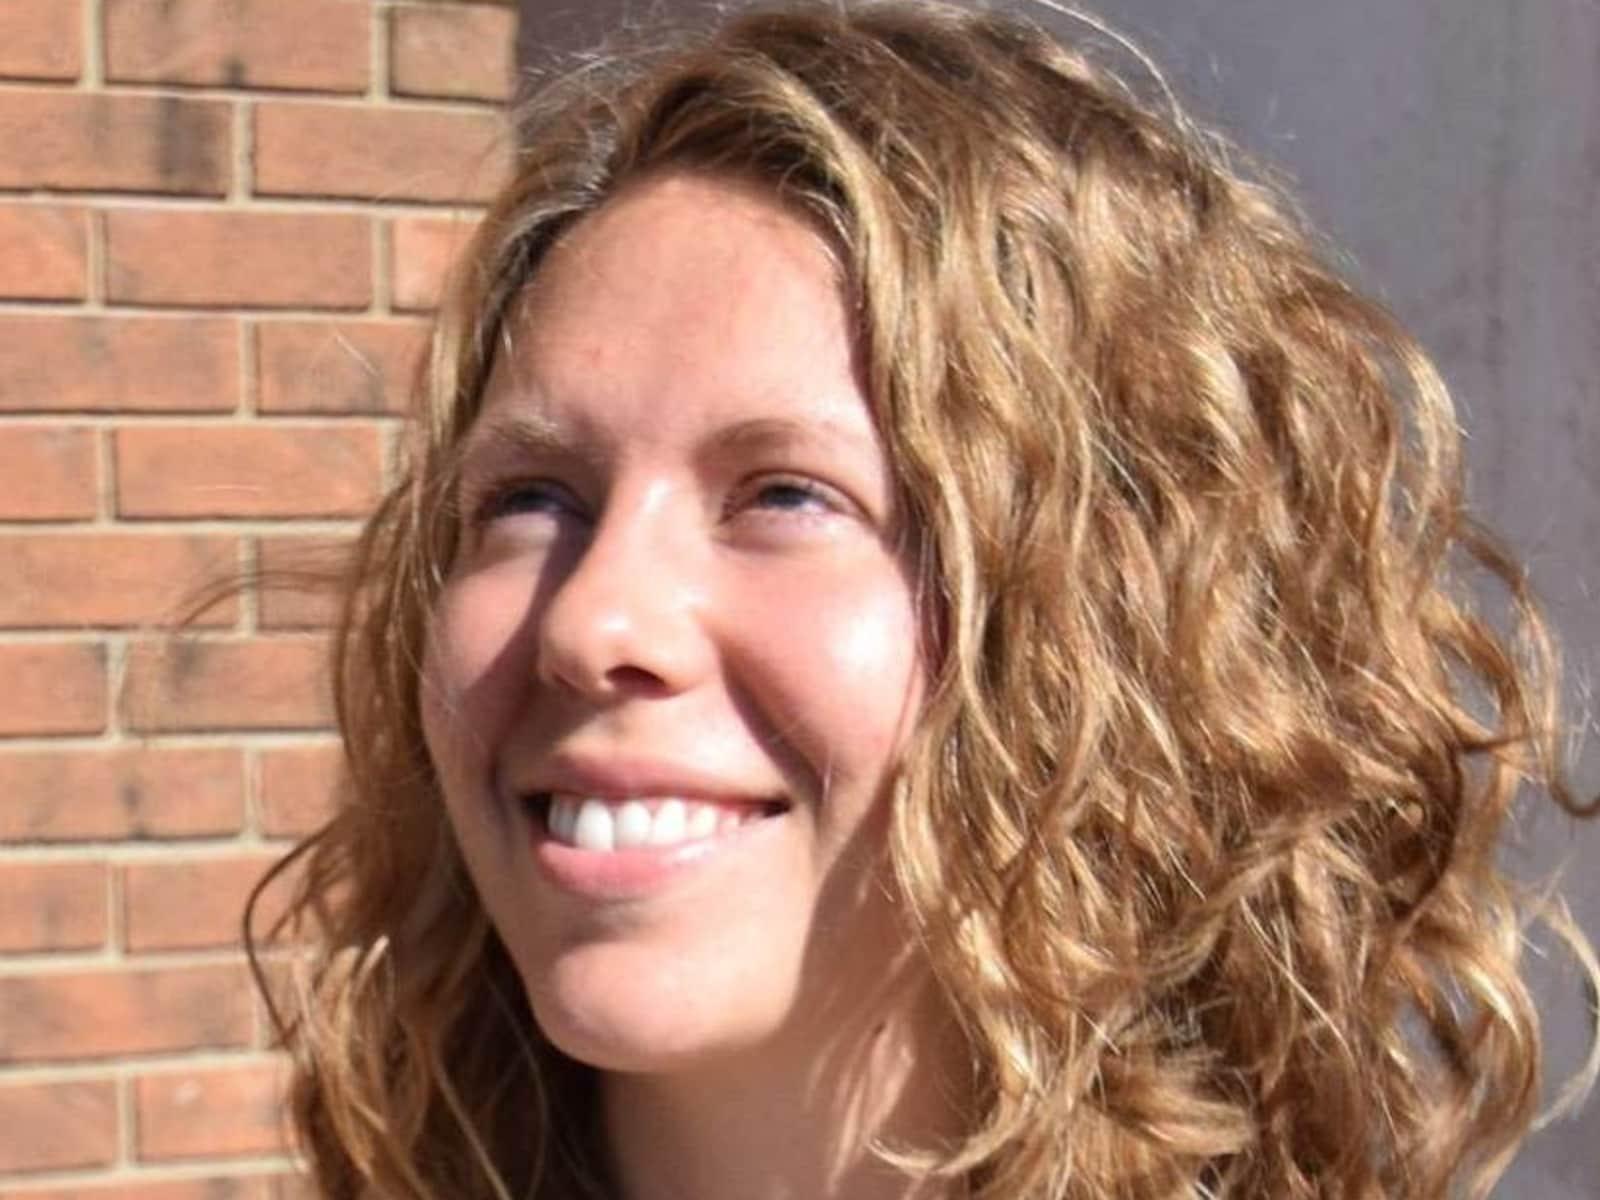 Heidi from Edmonton, Alberta, Canada